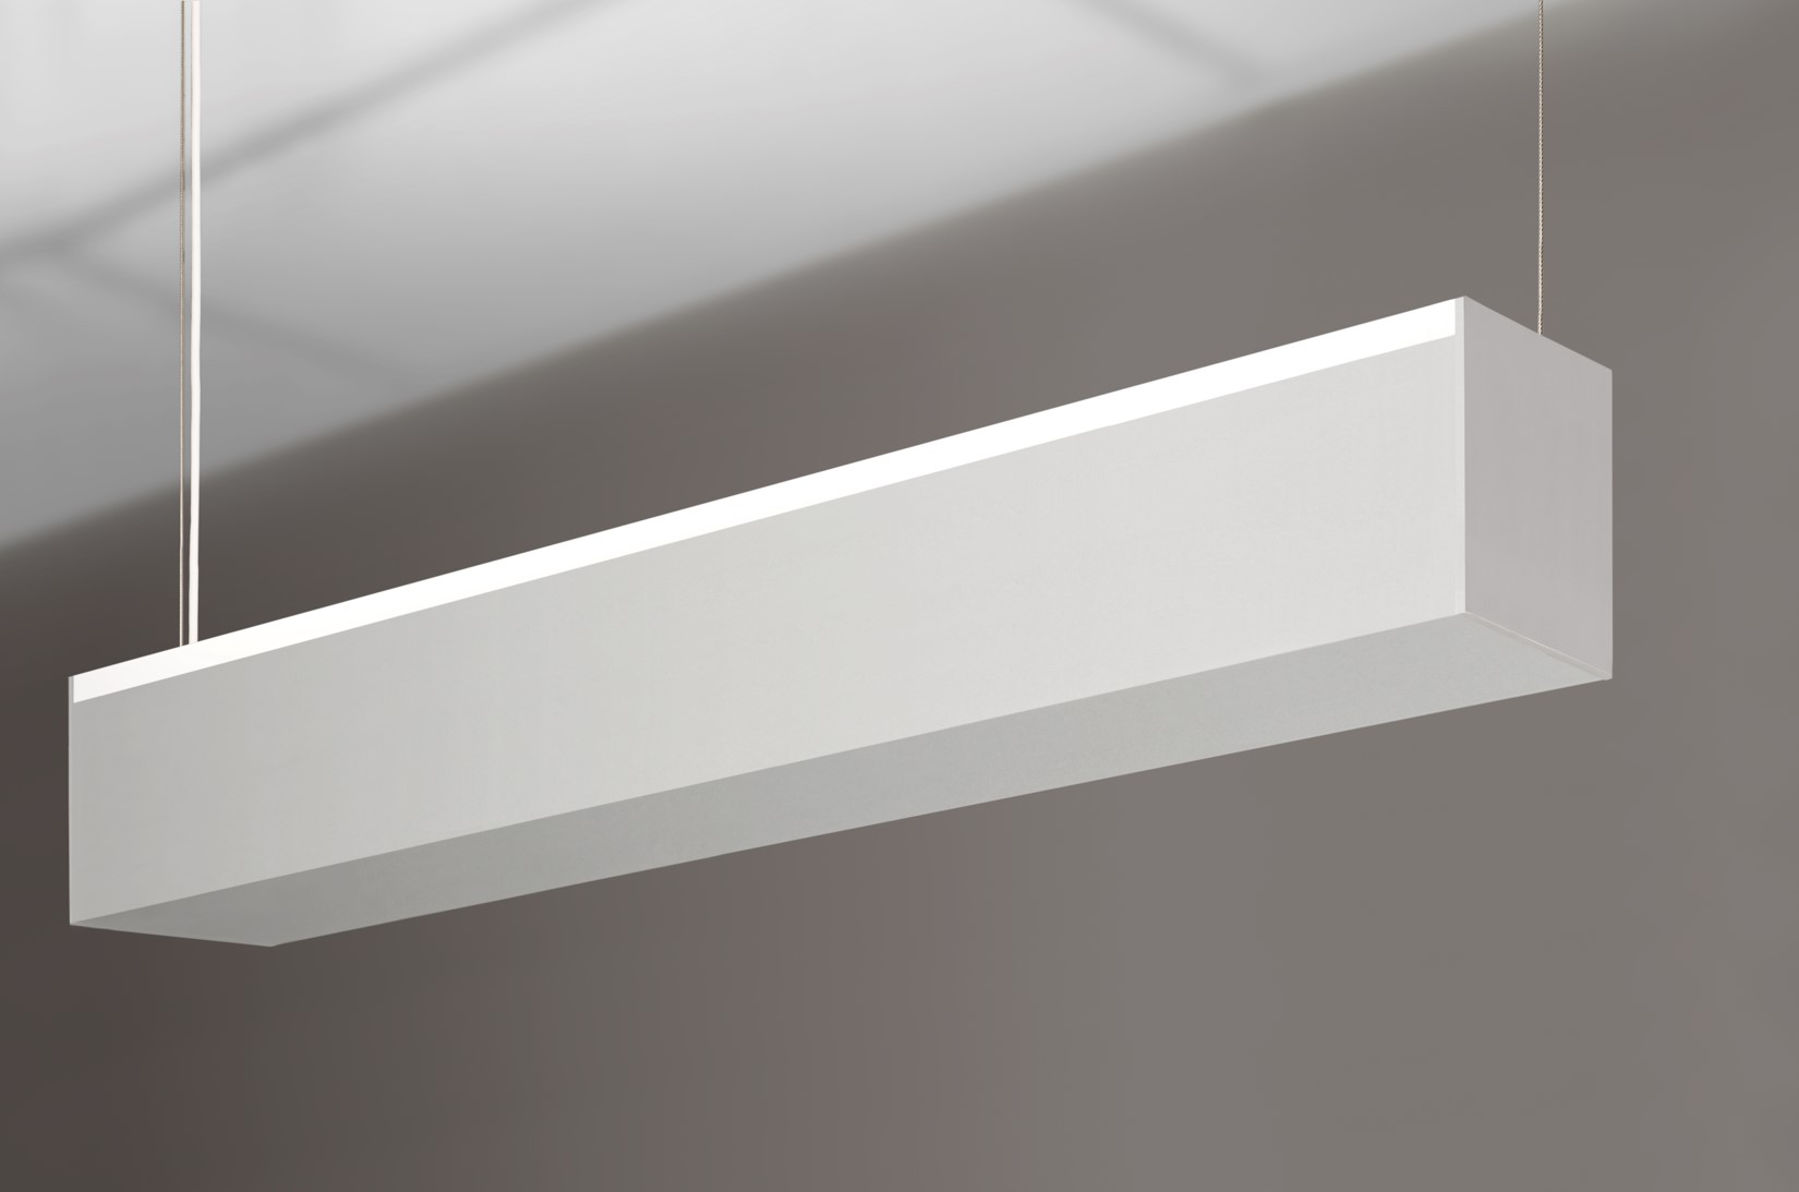 Picture of GX3D44U2-LED-LENS3D